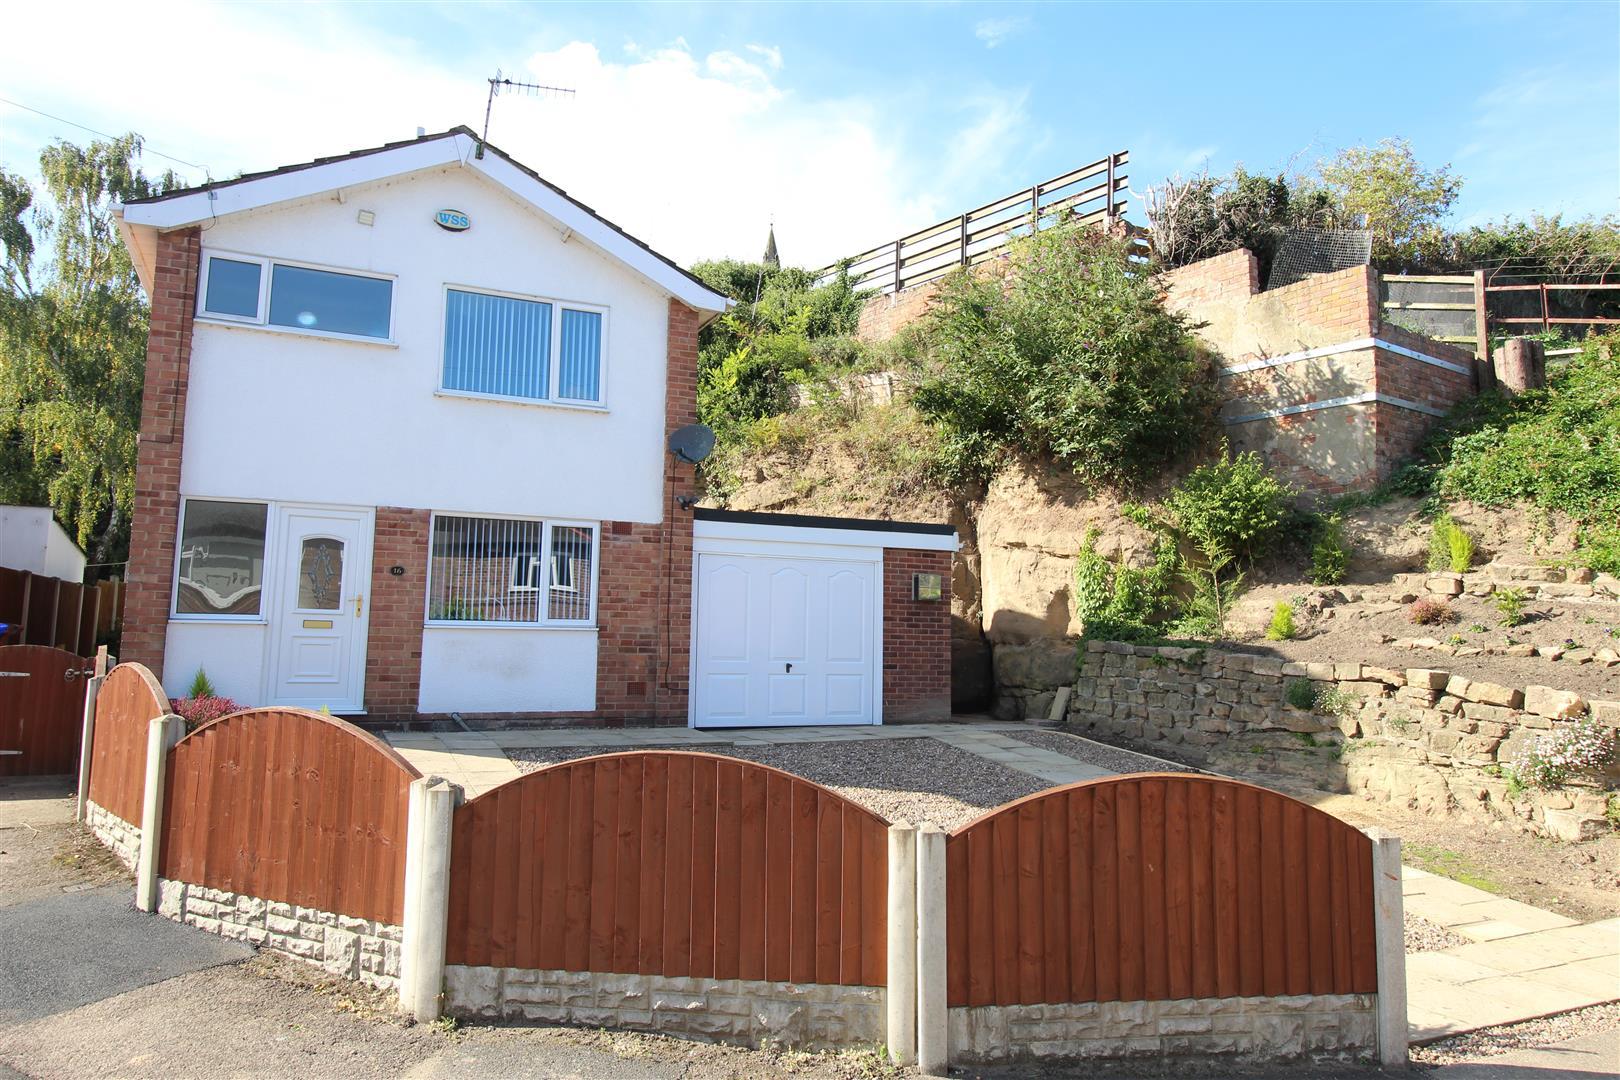 3 Bedrooms Detached House for sale in Moores Avenue, Sandiacre, Nottingham